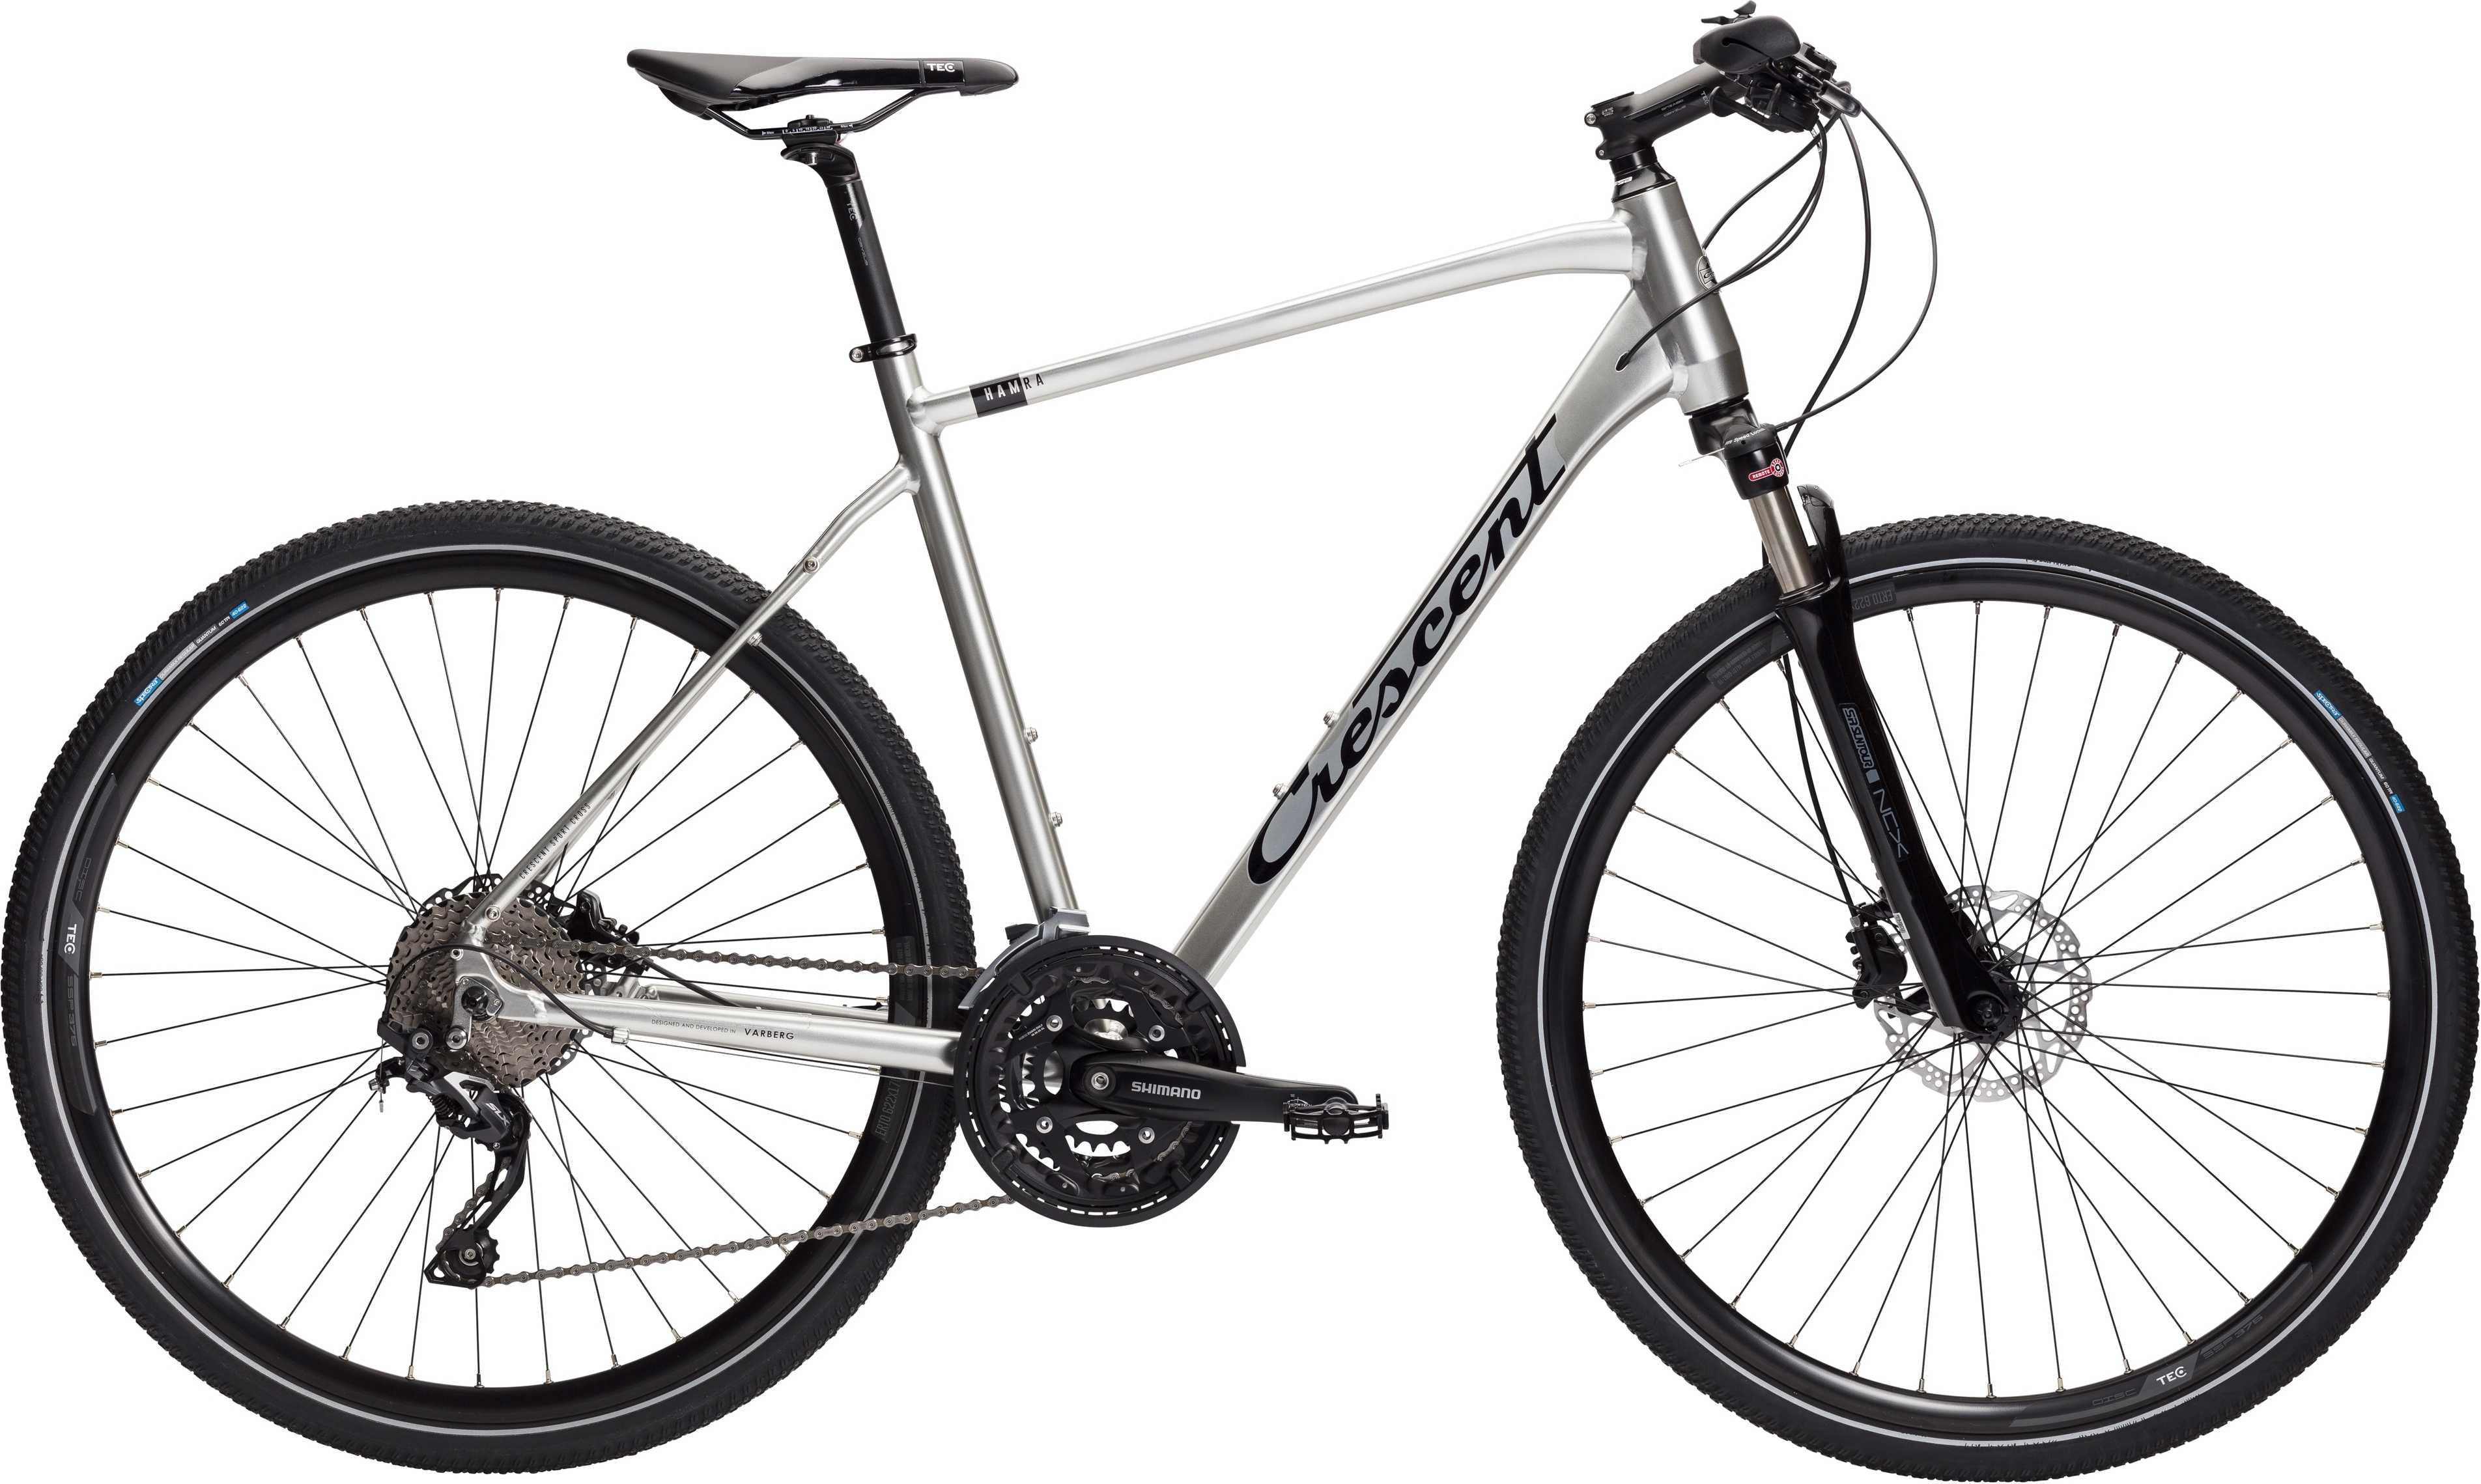 CRESCENT HAMRA S | City-cykler